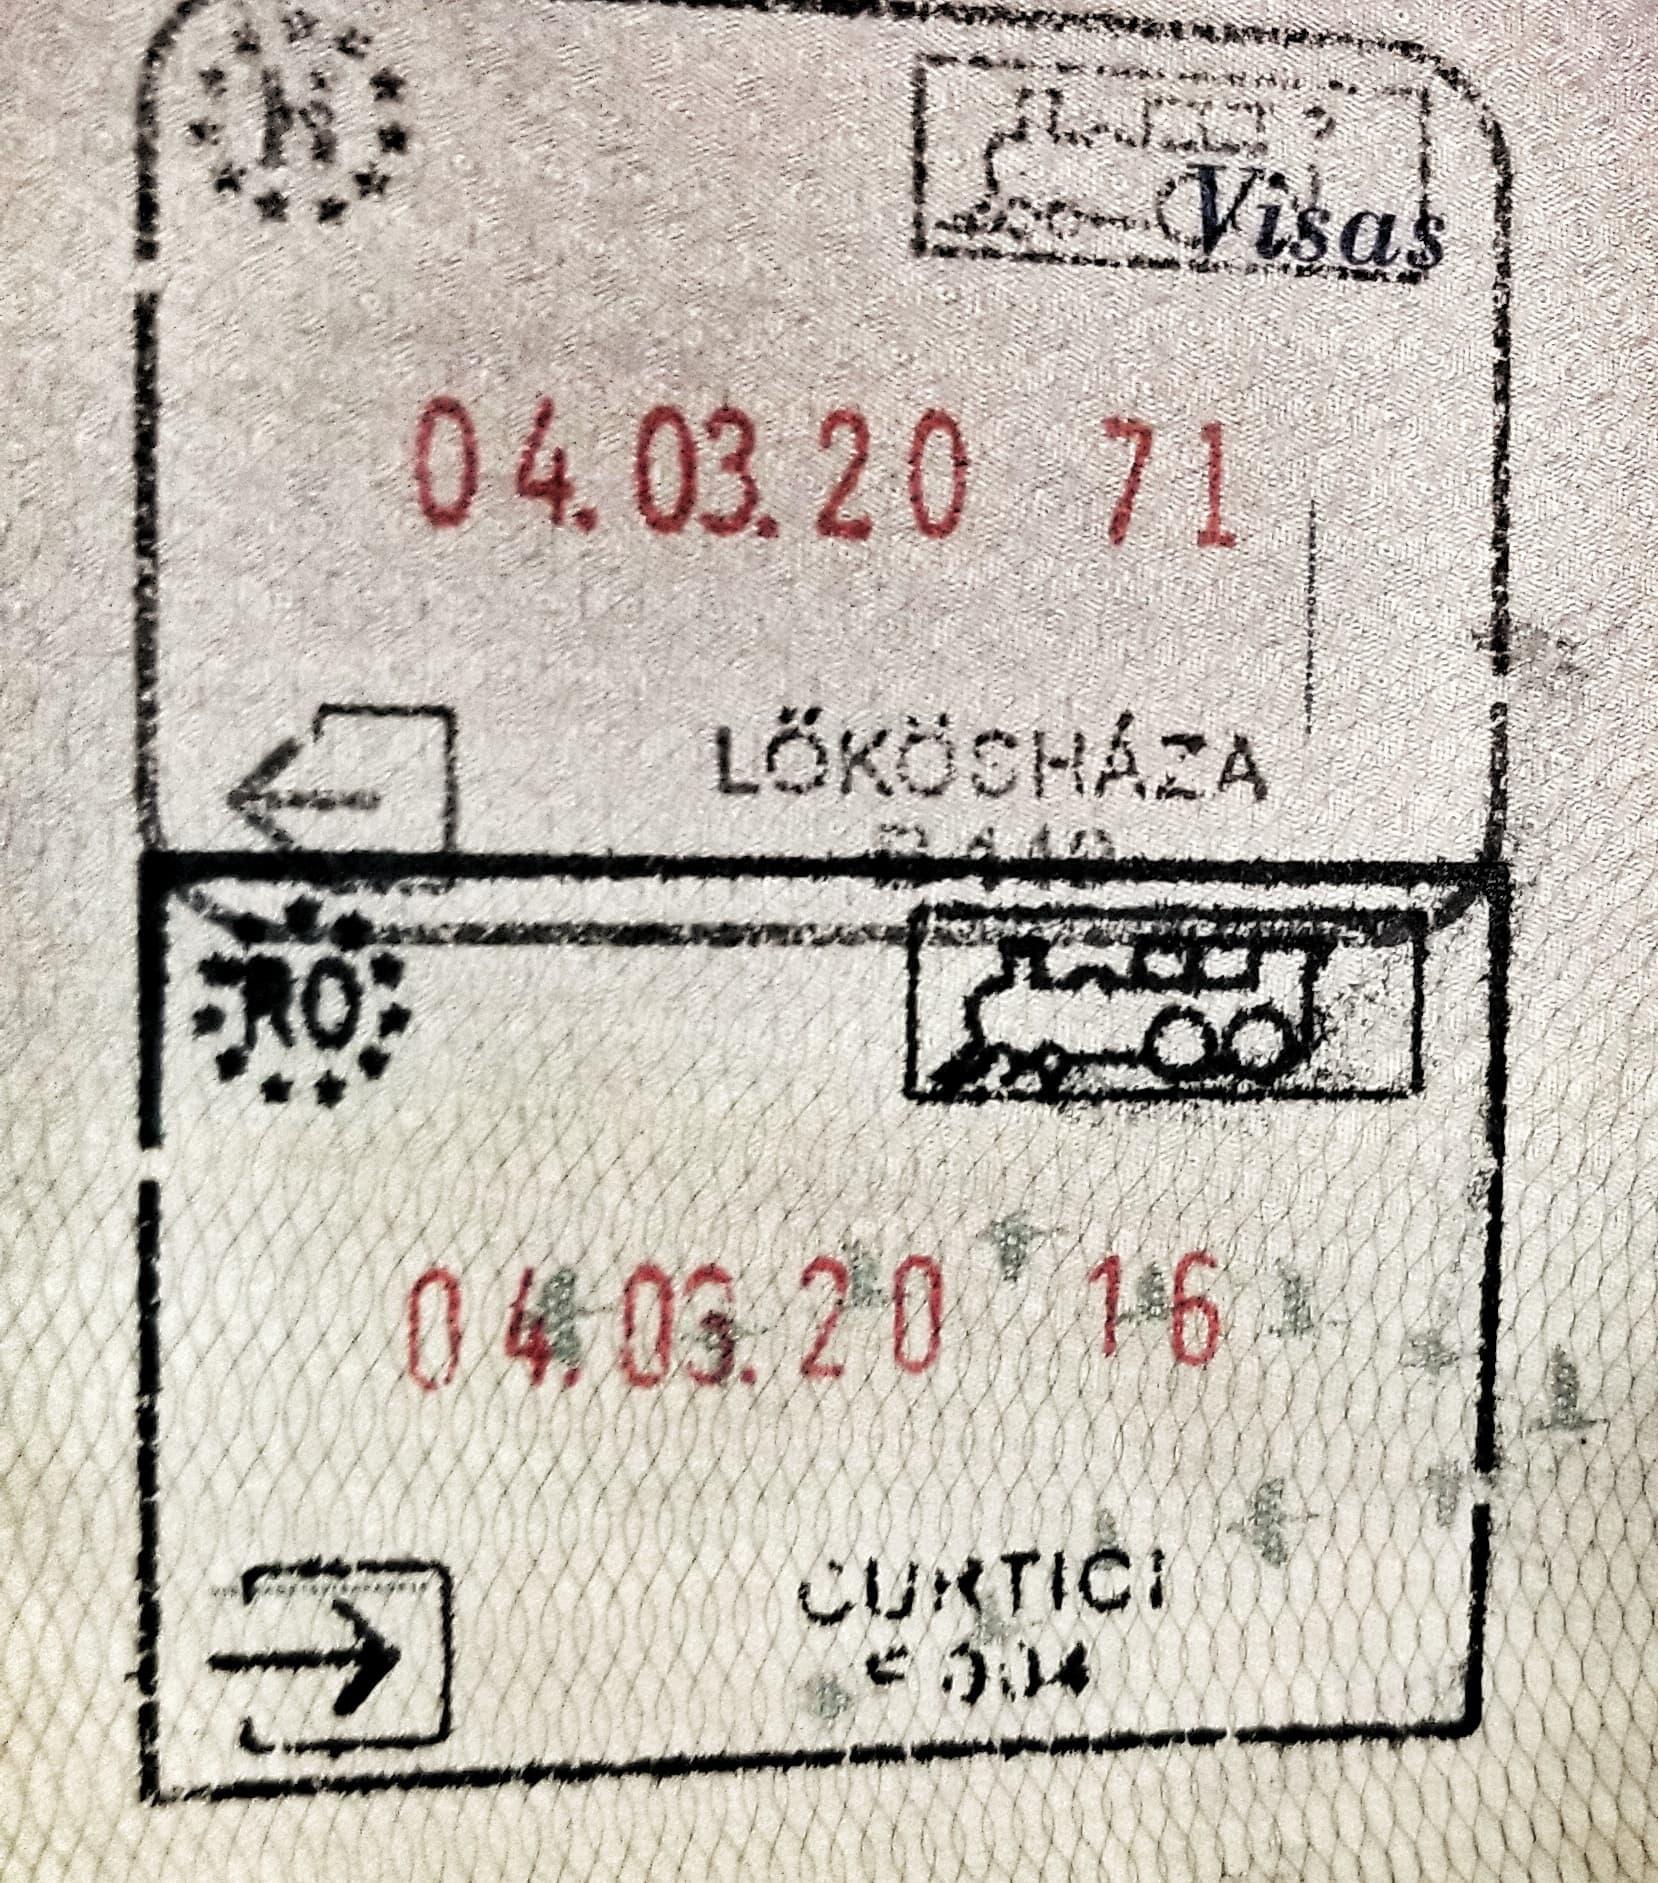 Passport stamps from Lokoshaza, Hungary and Curtici, Romania.